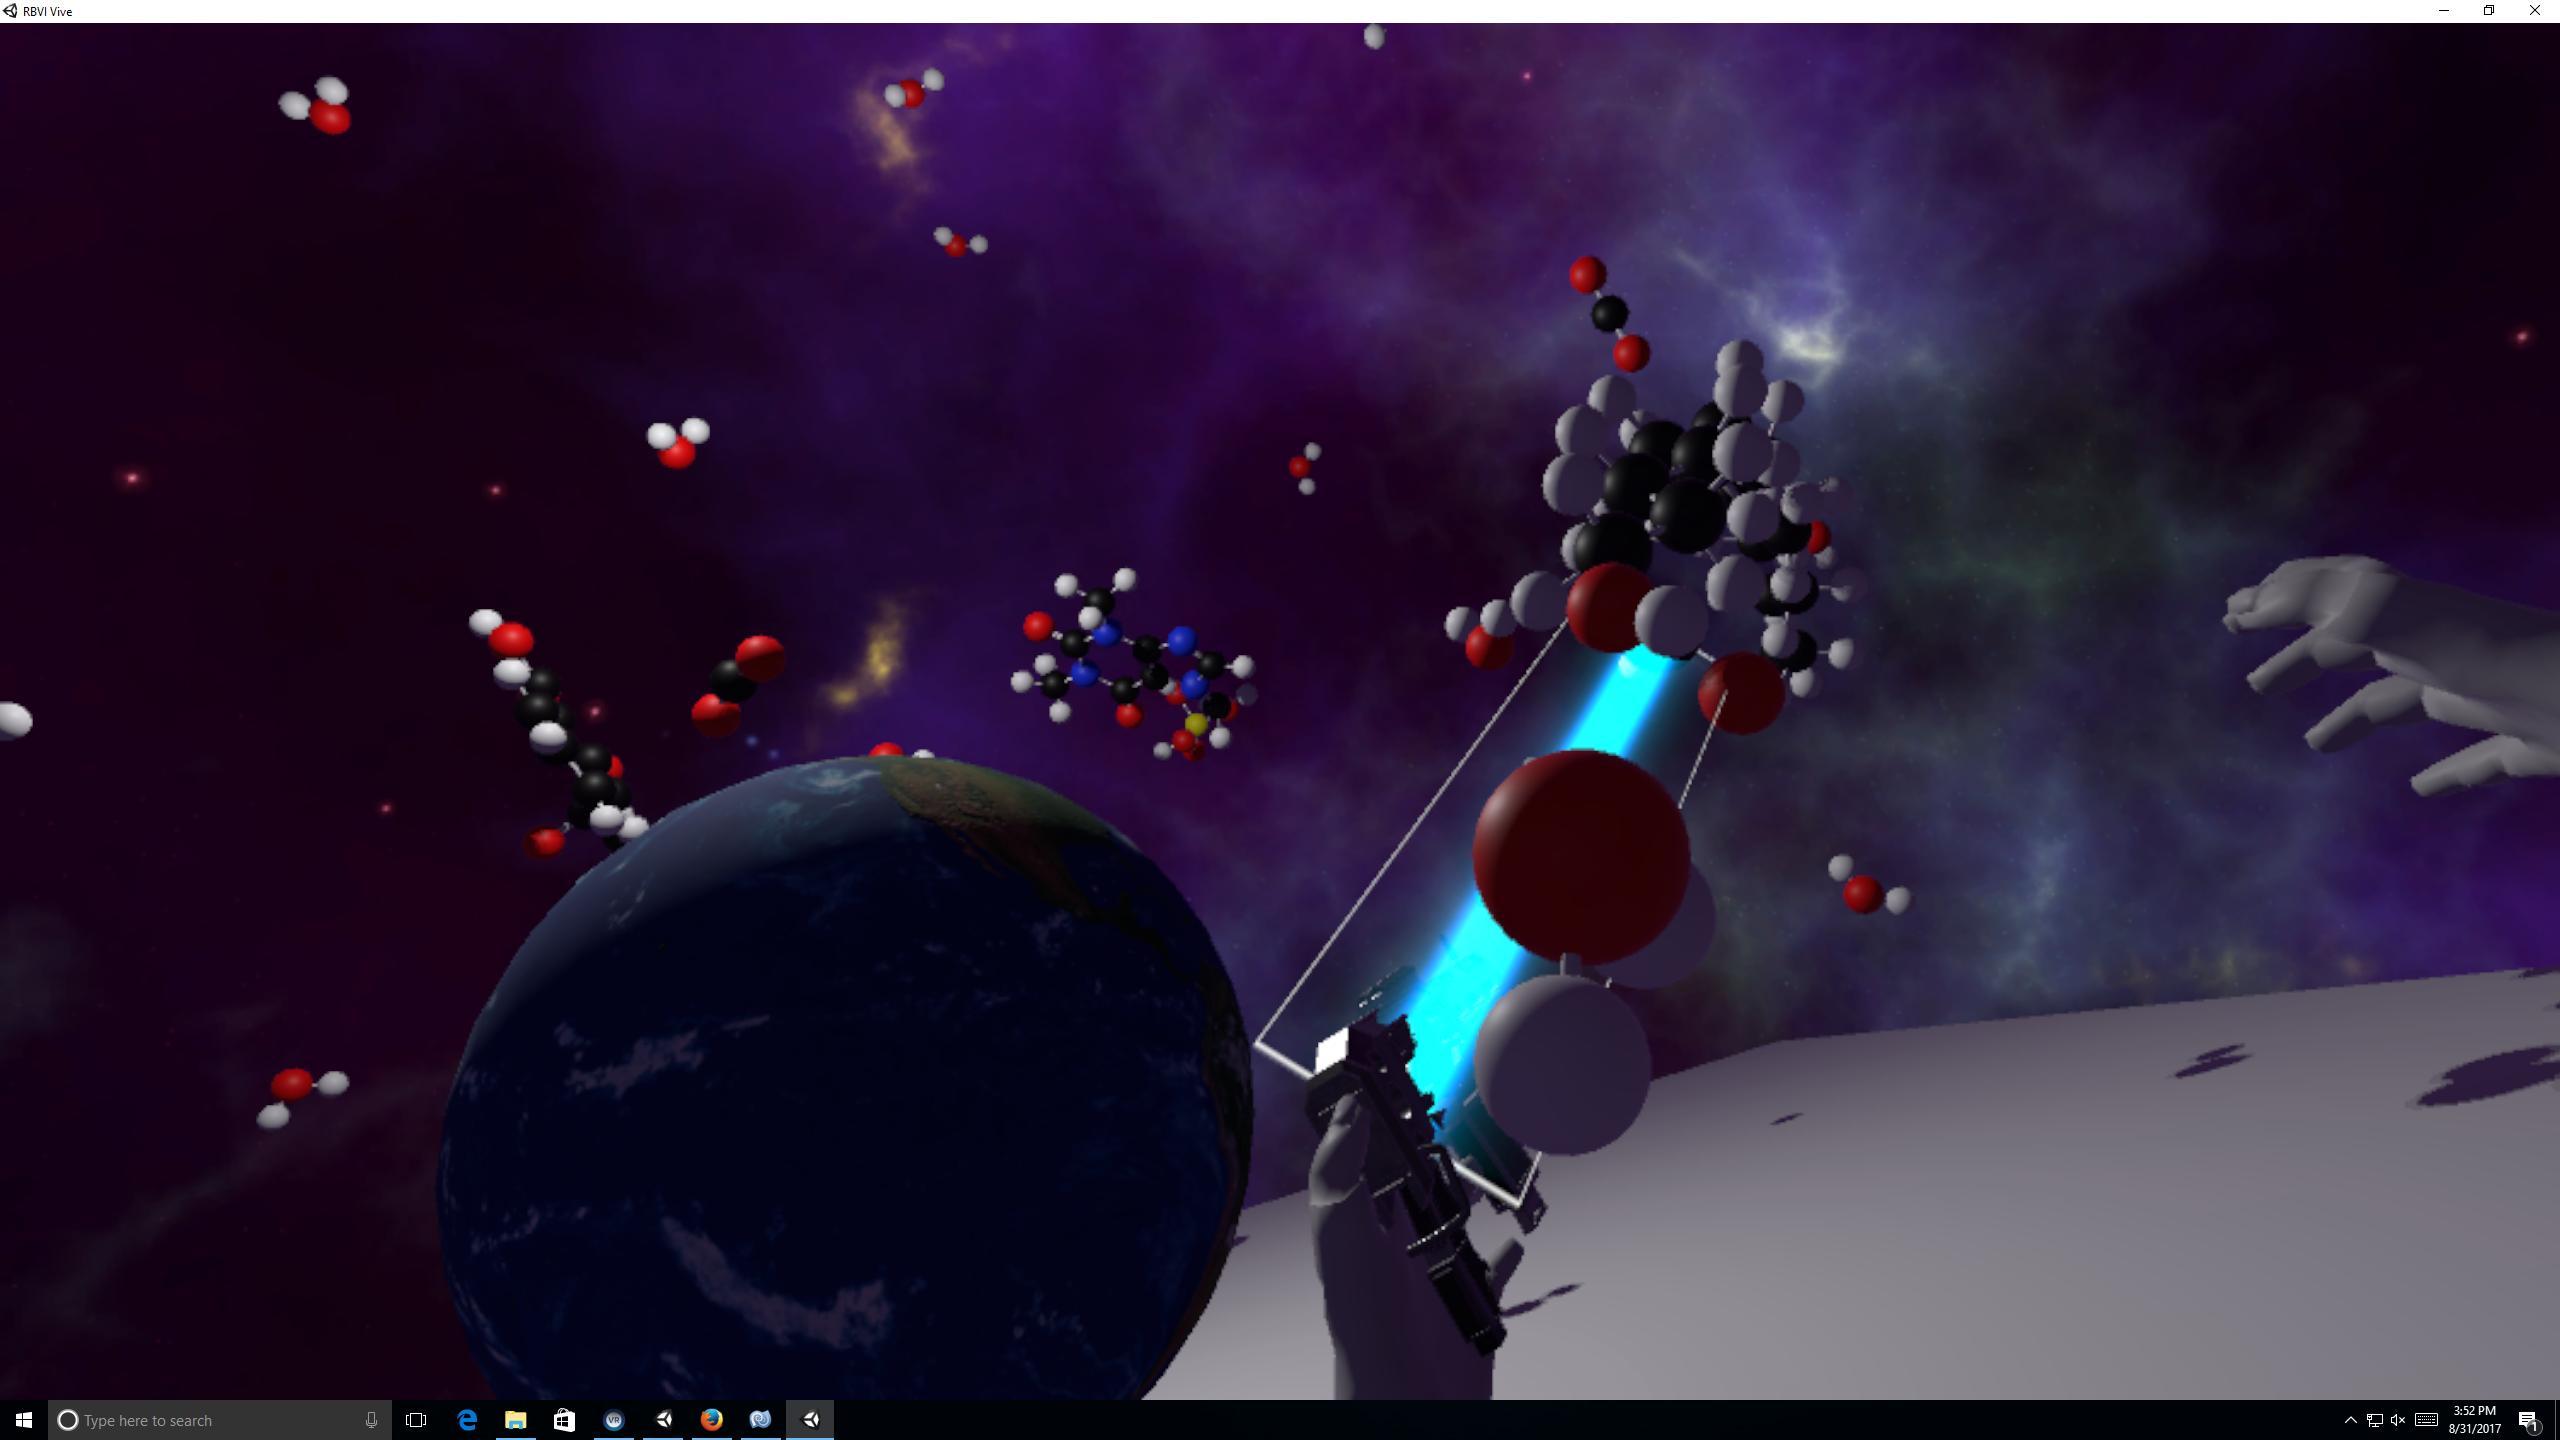 VR examples using ChimeraX